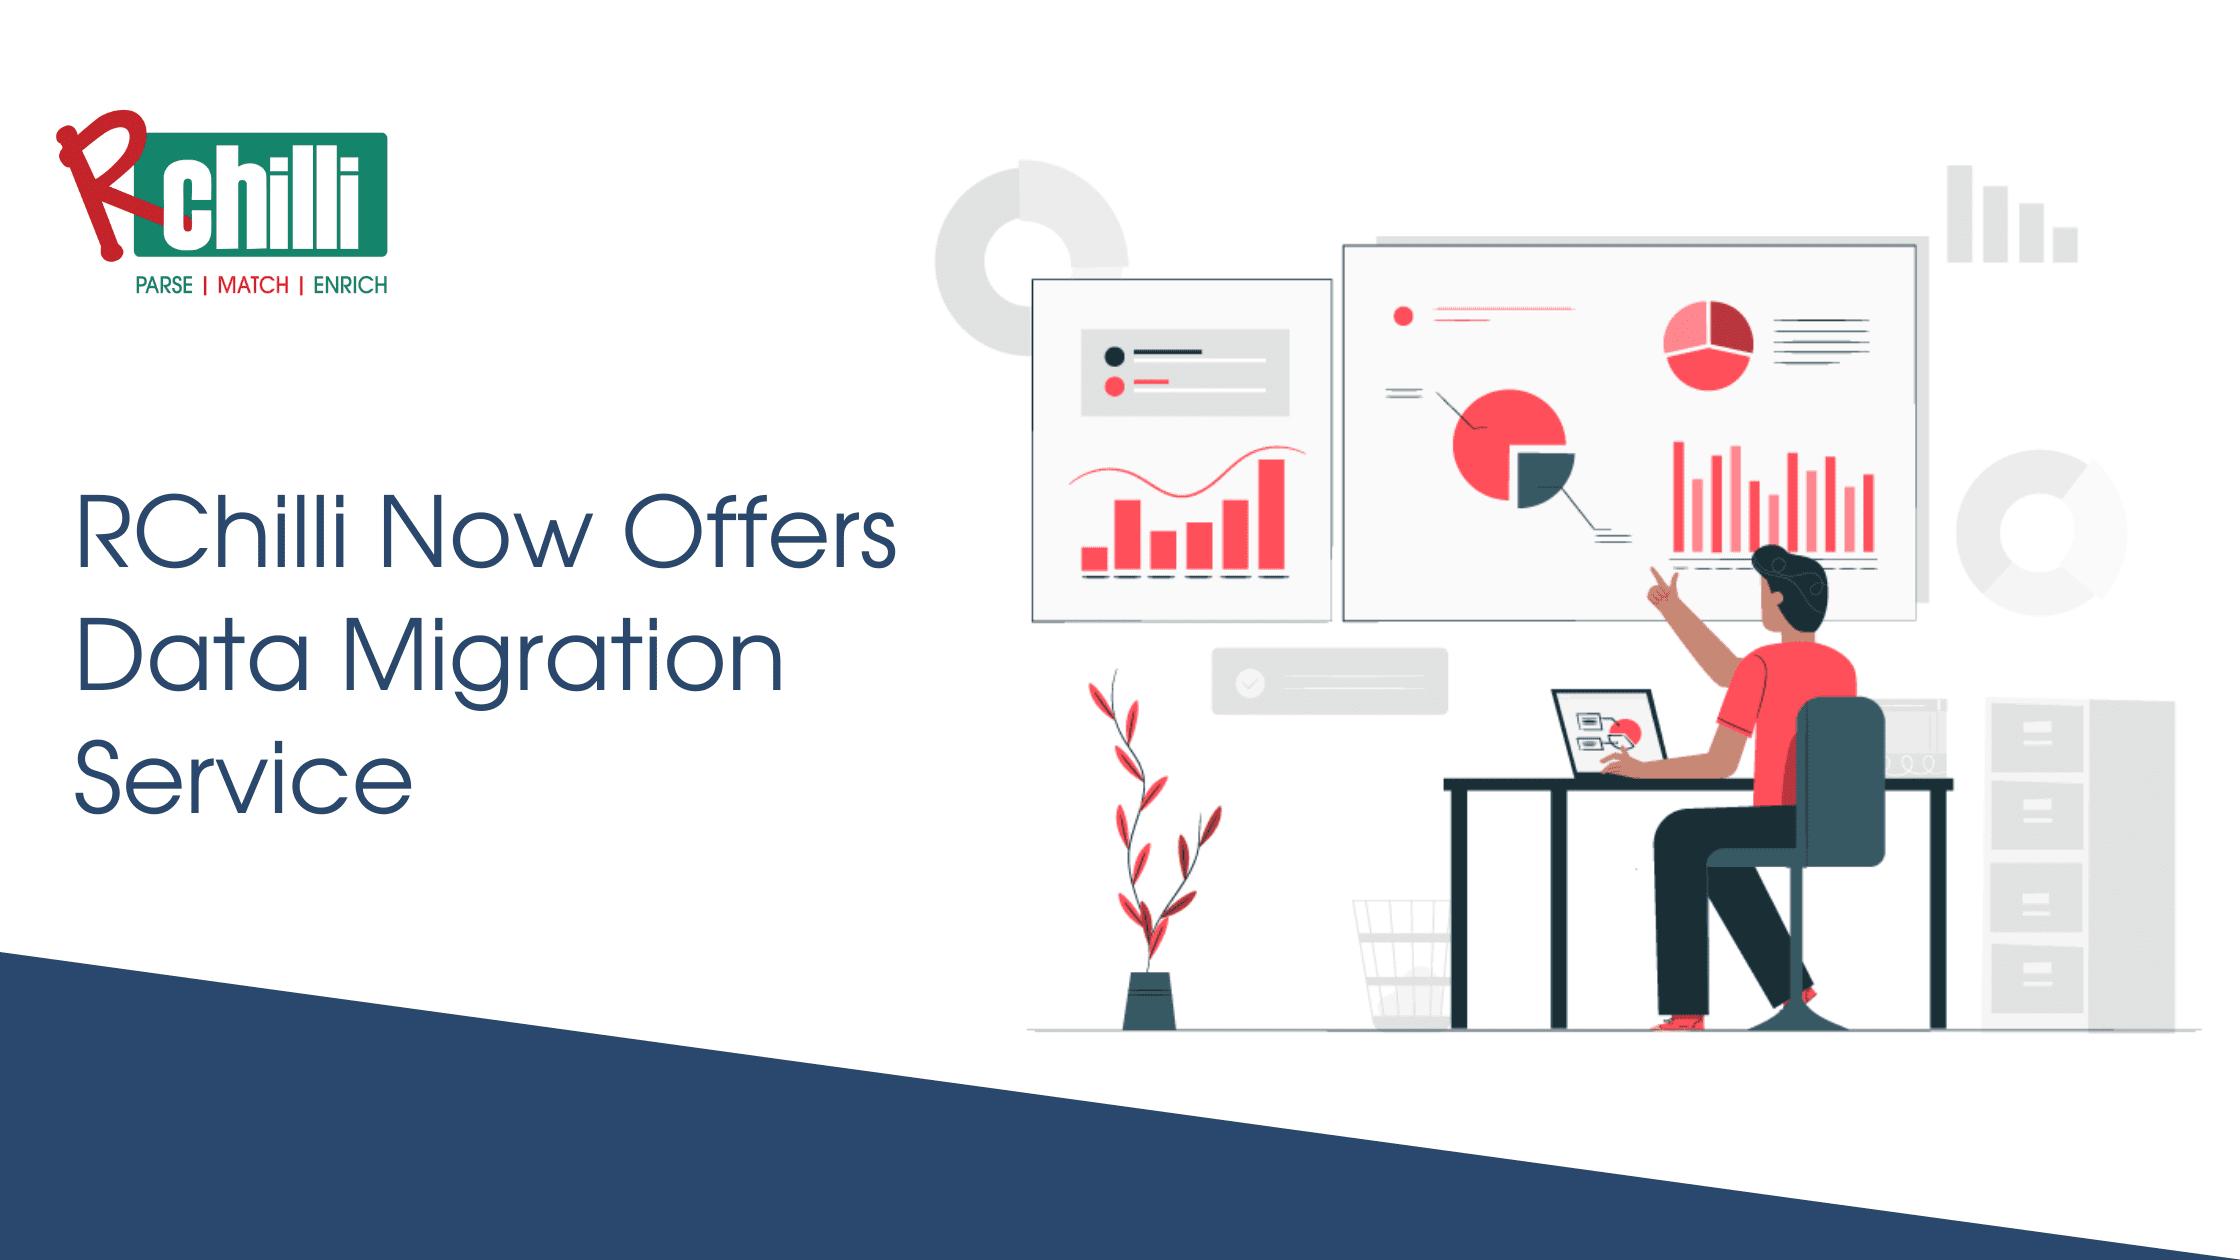 RChilli Now Offers Data Migration Service